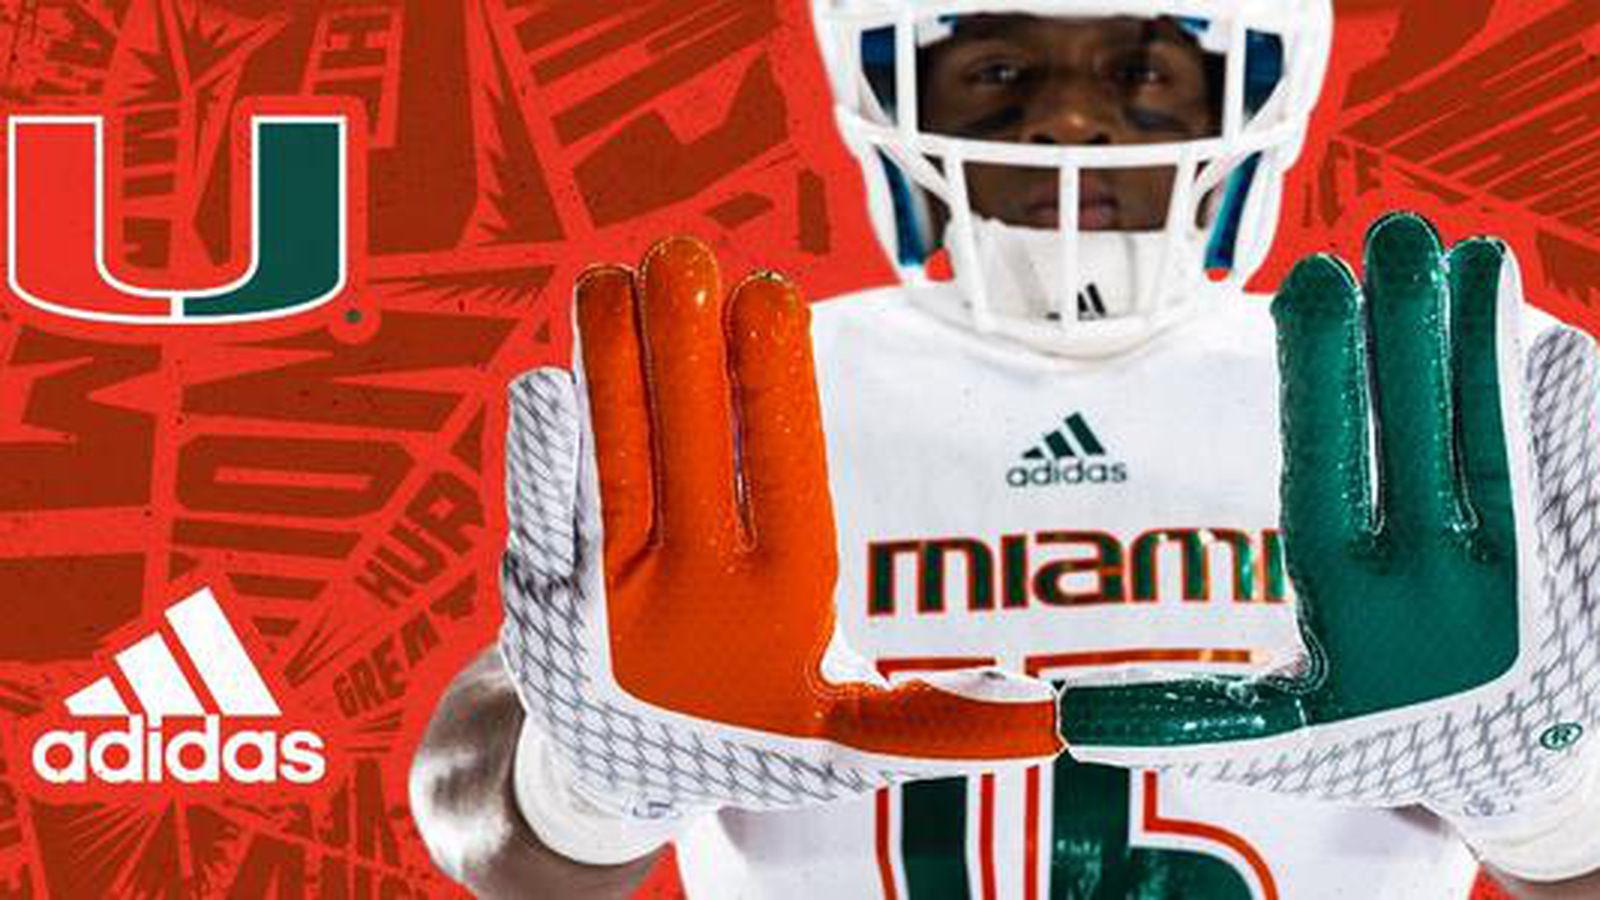 The Miami Hurricanes New Football Uniforms Are